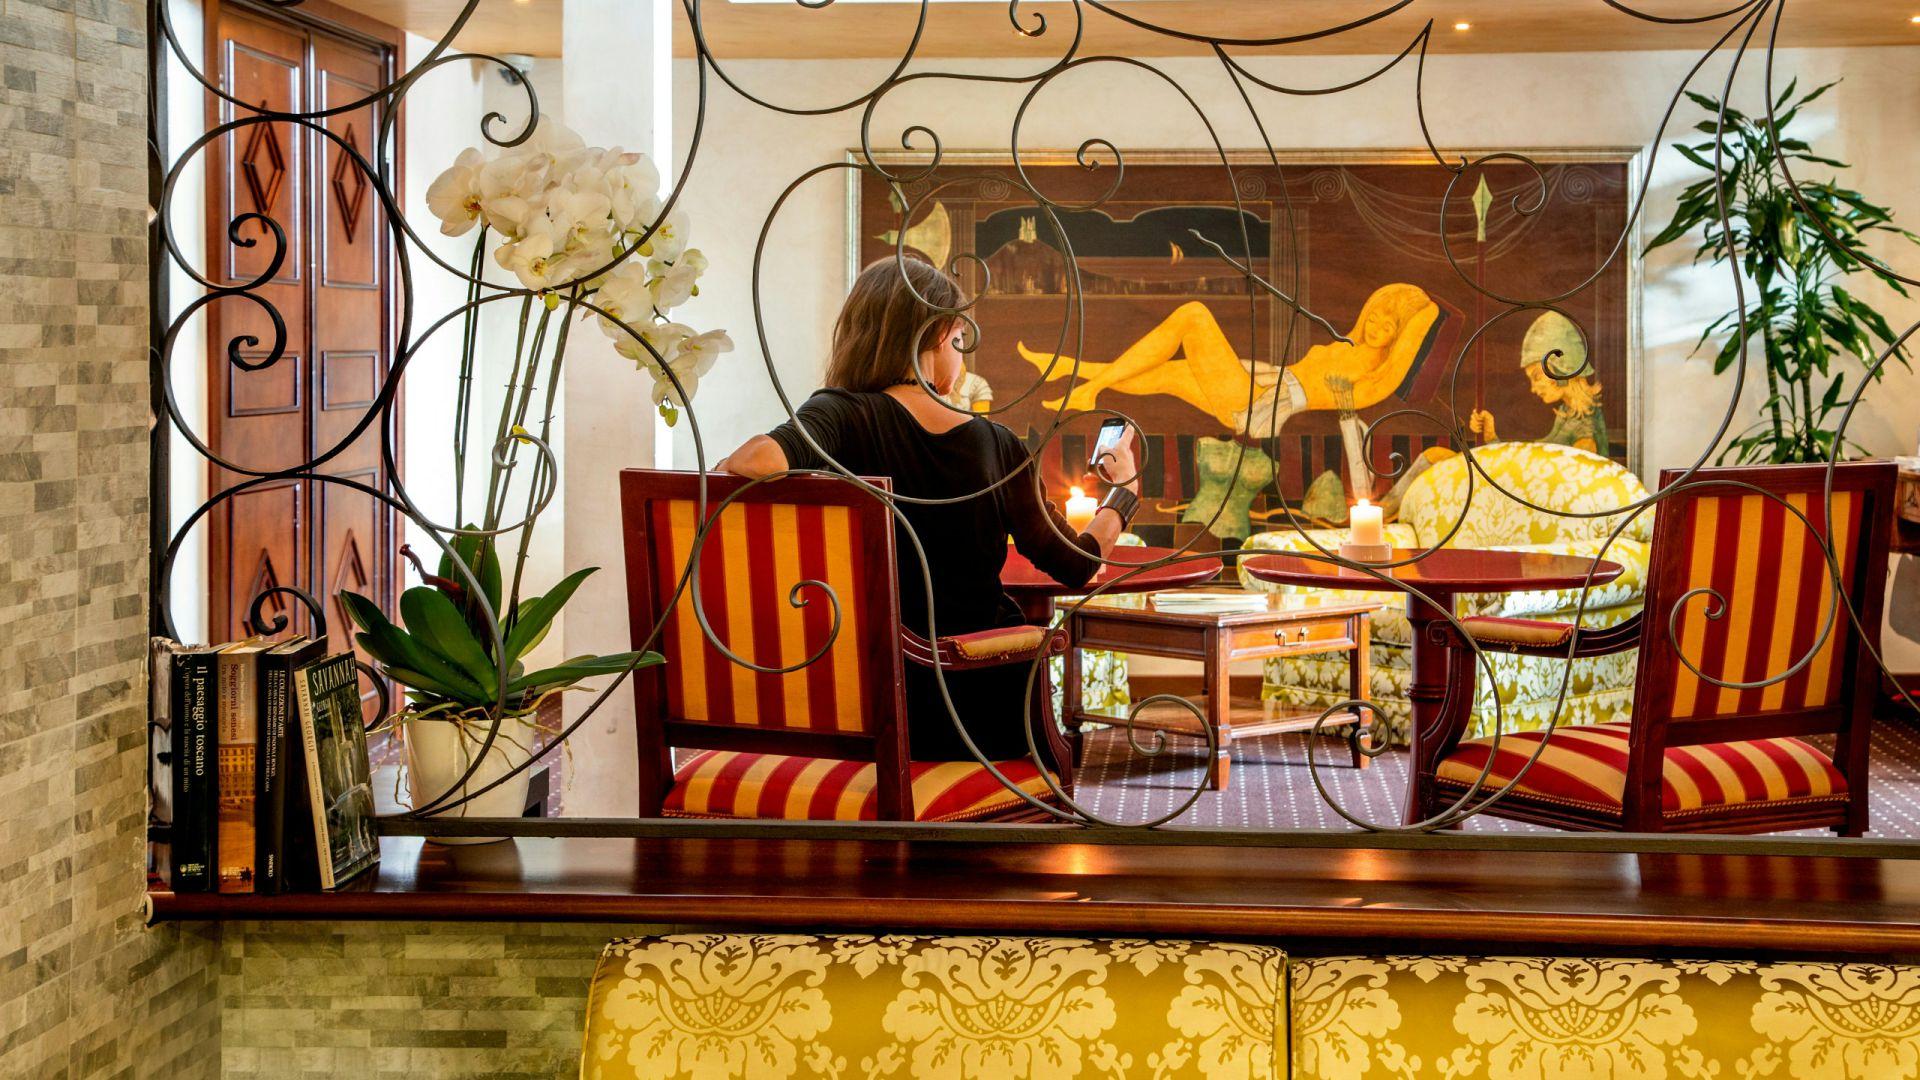 Foto-Hotel-Oxford-Roma-hóspedes-6